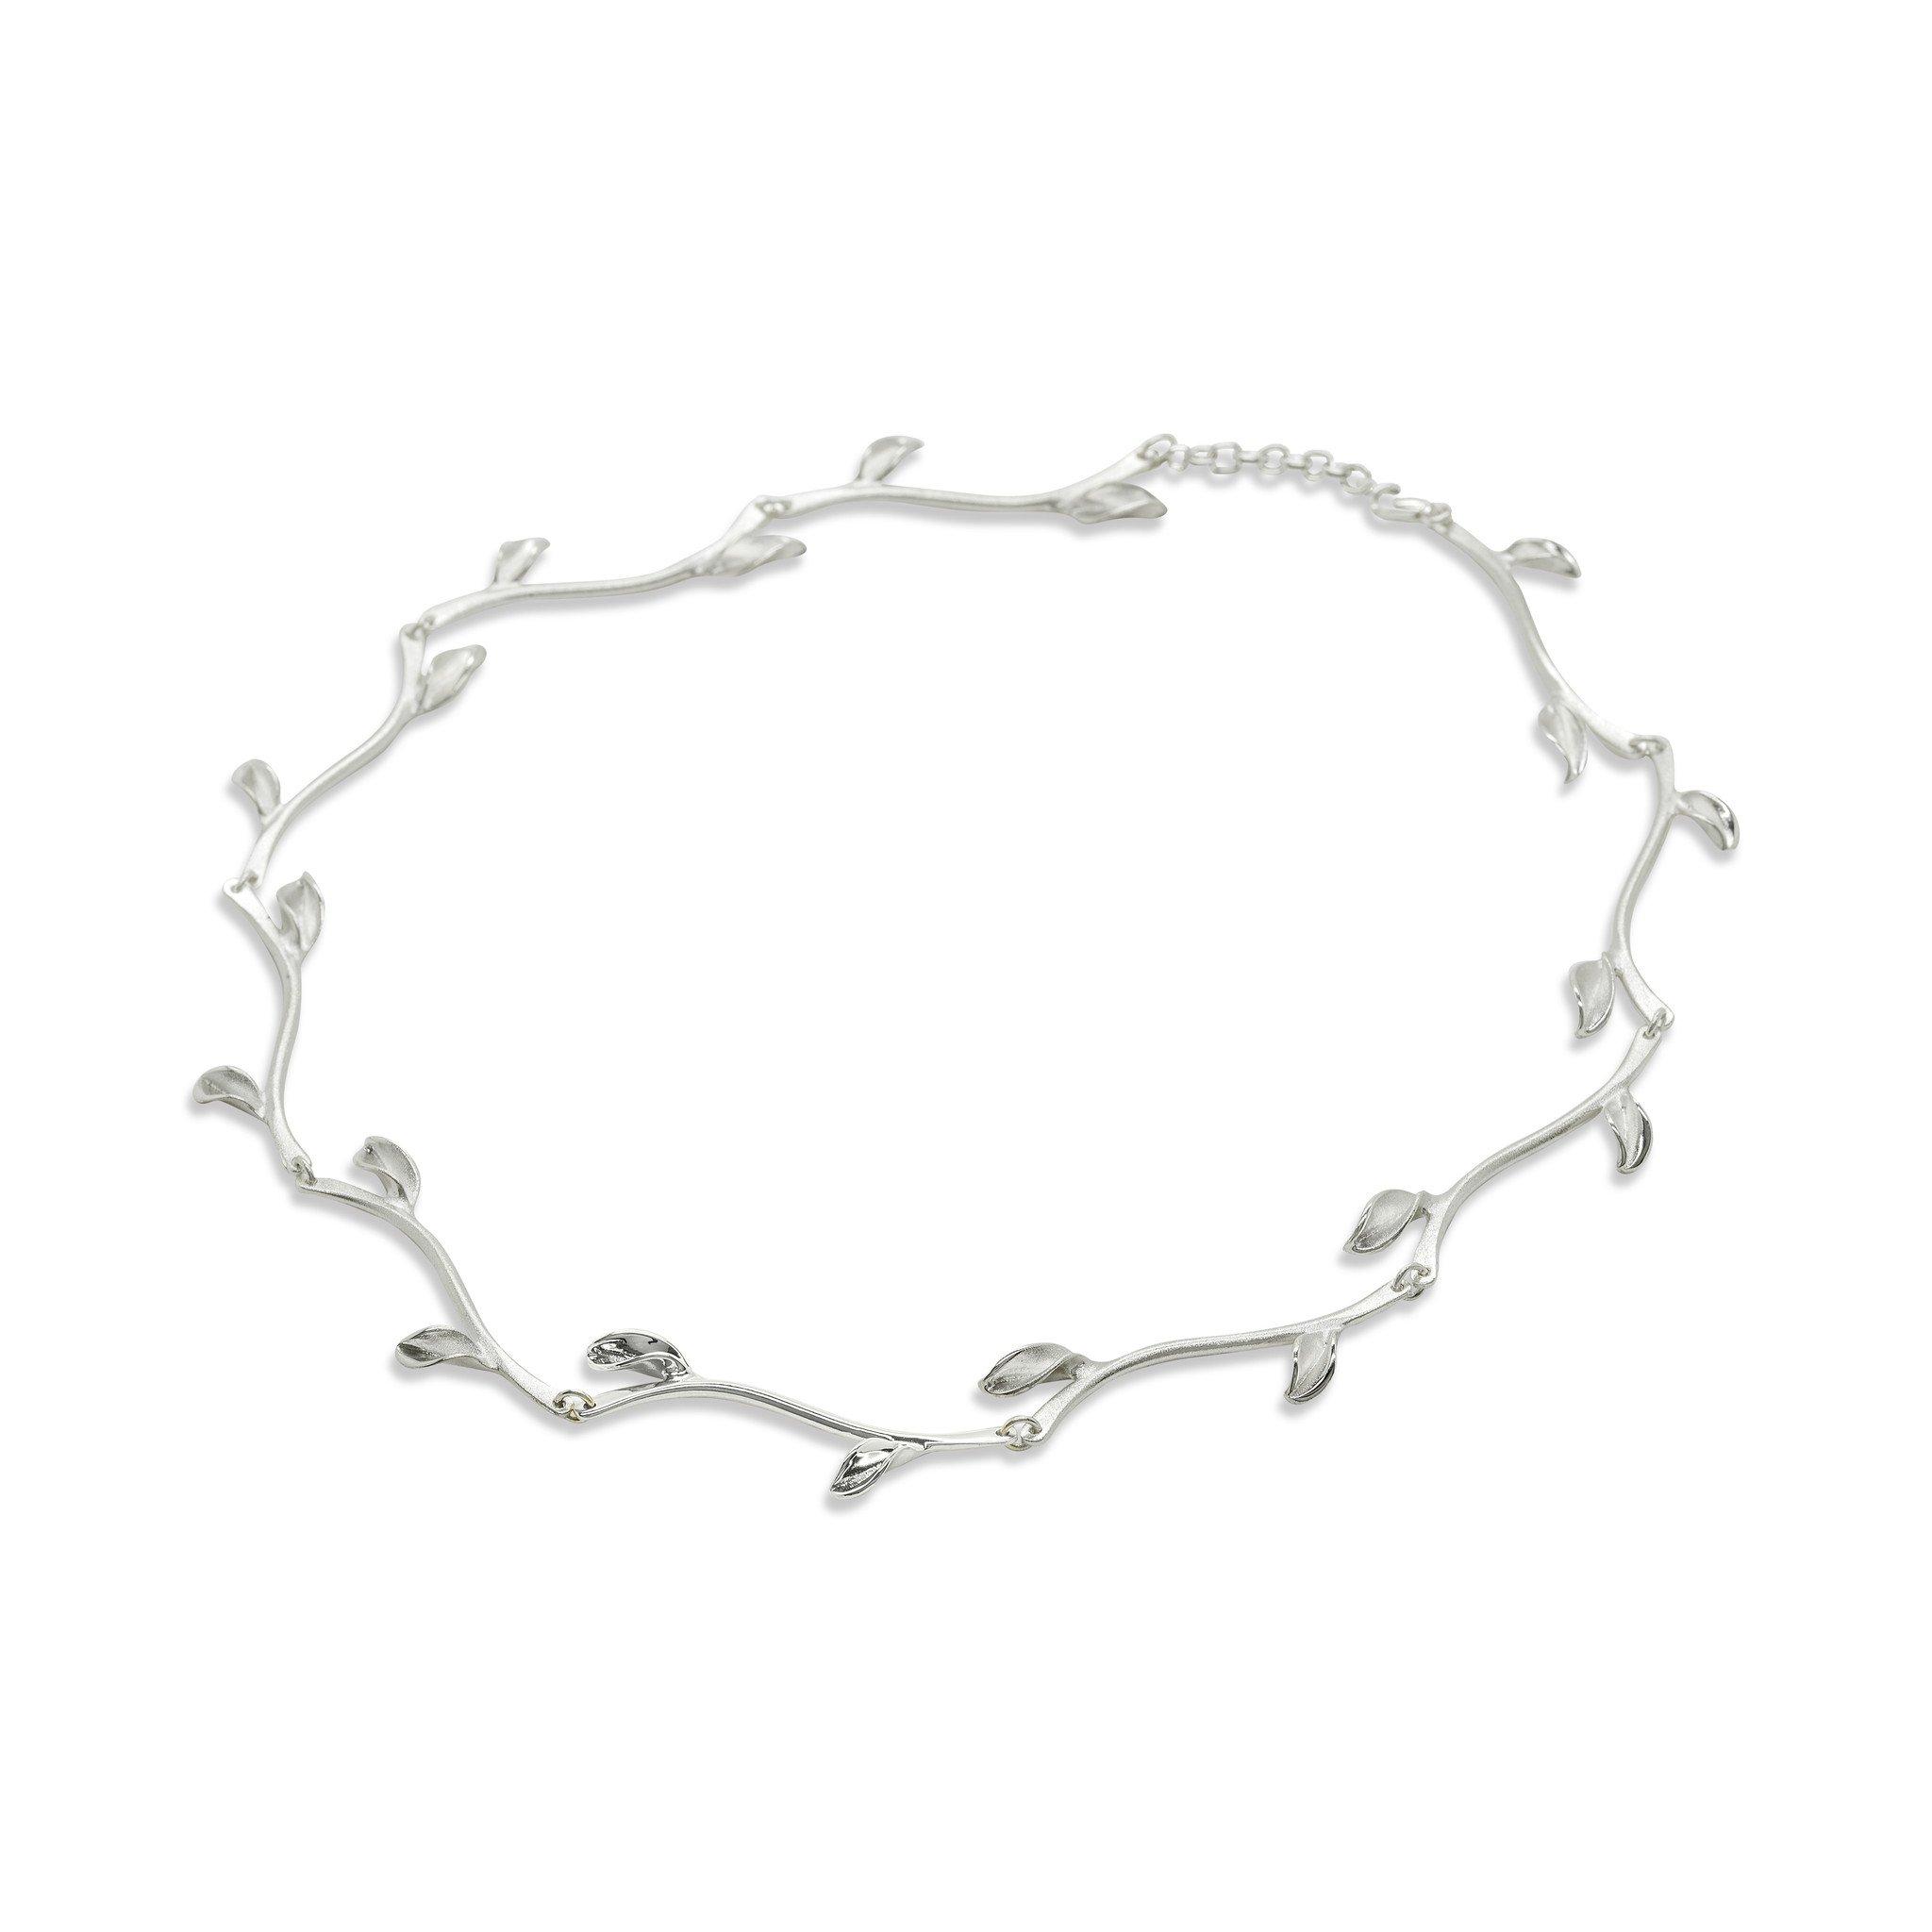 Mavilo Leaf Stem Necklace